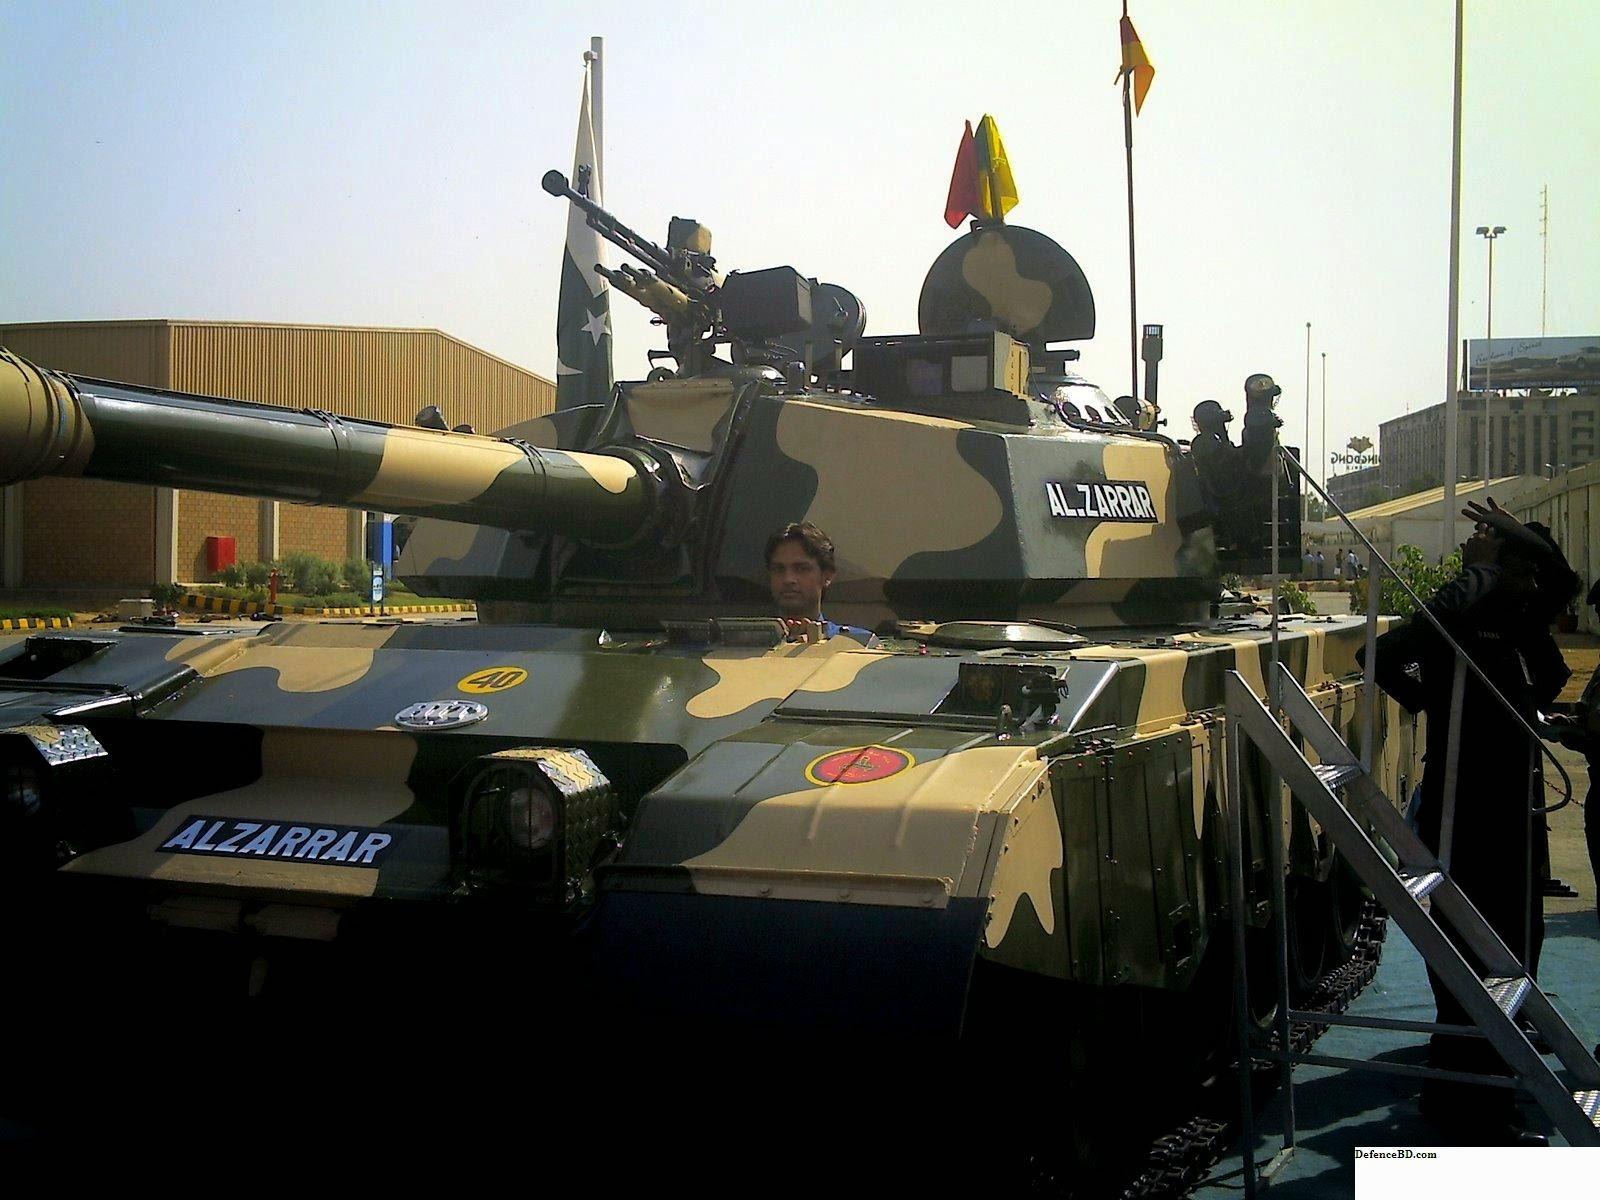 Al Zarrar Tank Bangladesh